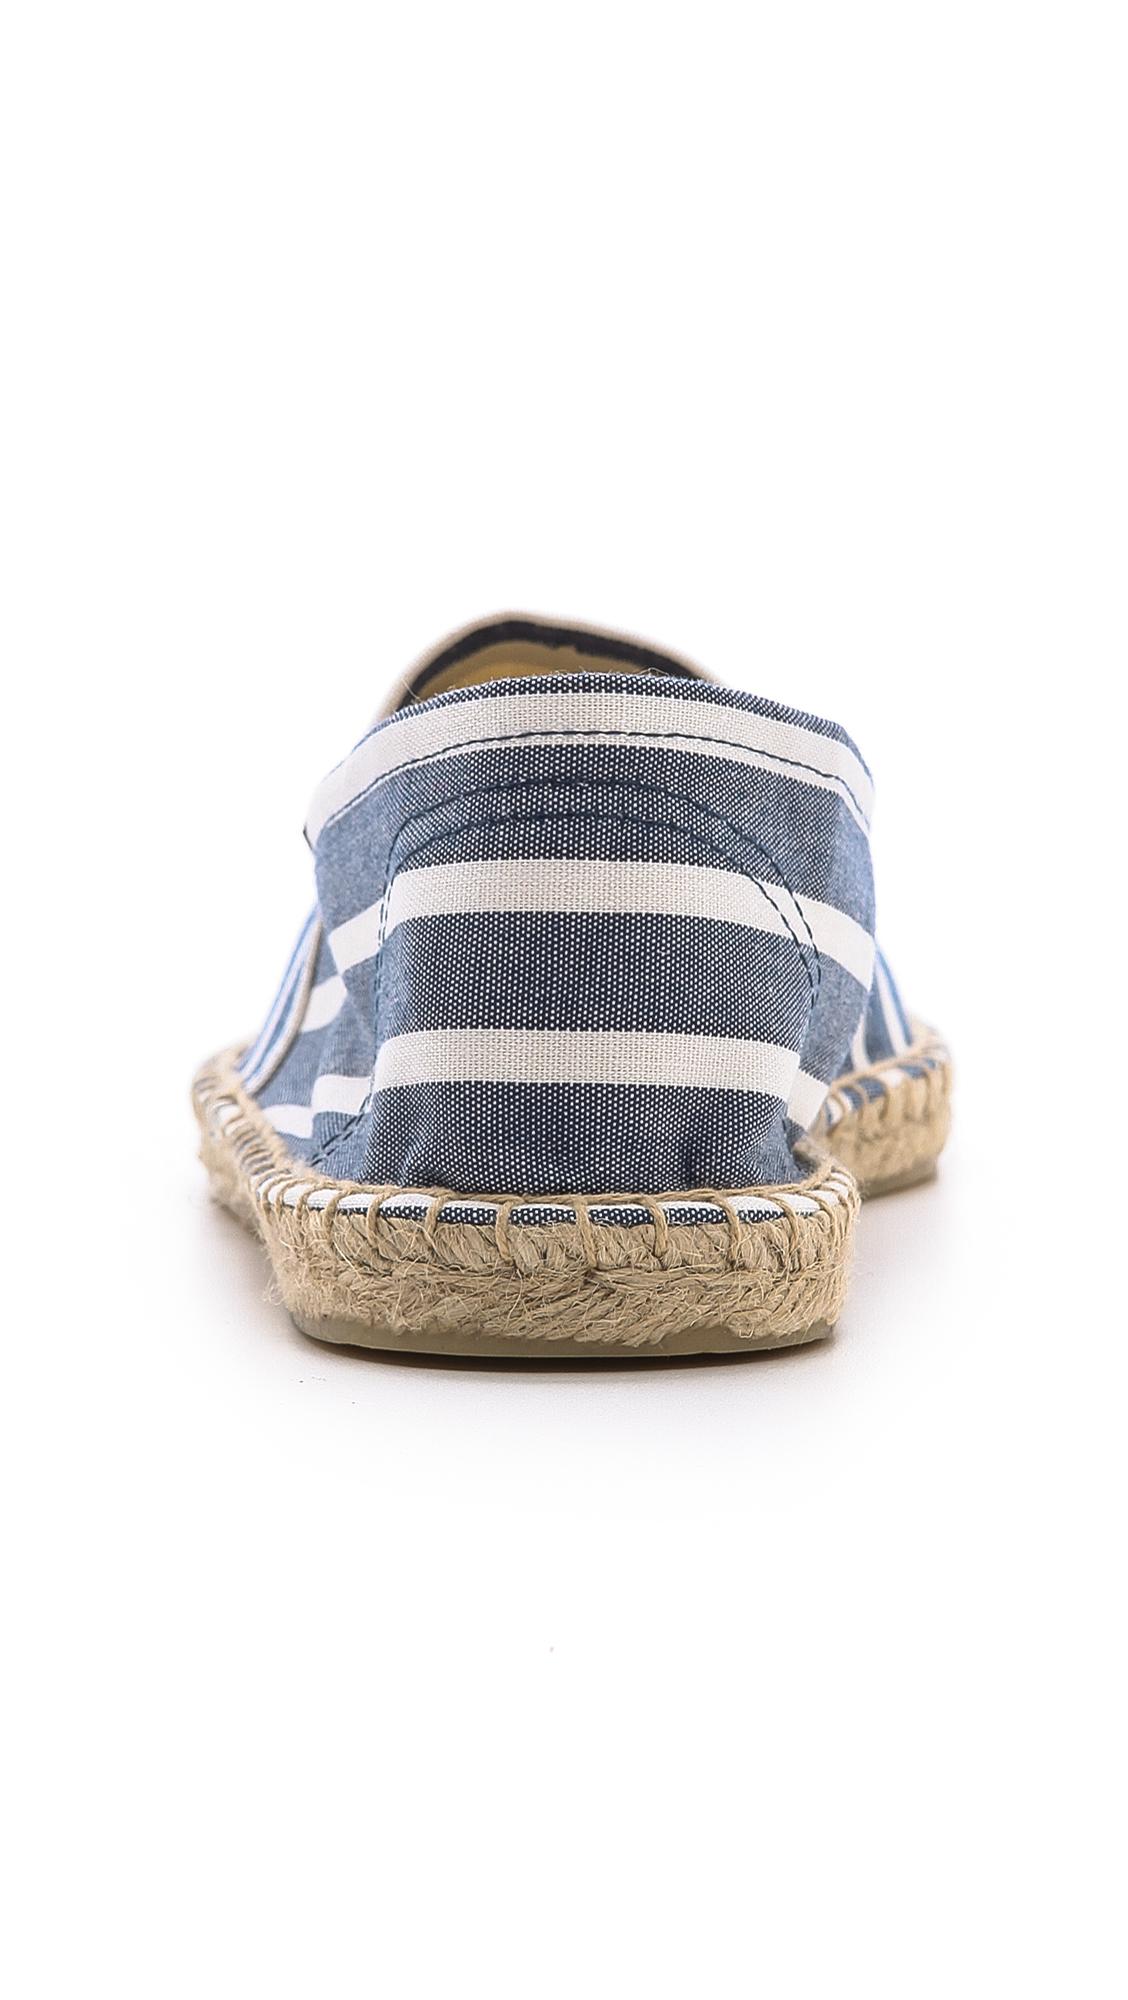 Soludos Original Classic Stripe Espadrilles in Light Navy/White (Blue) for Men